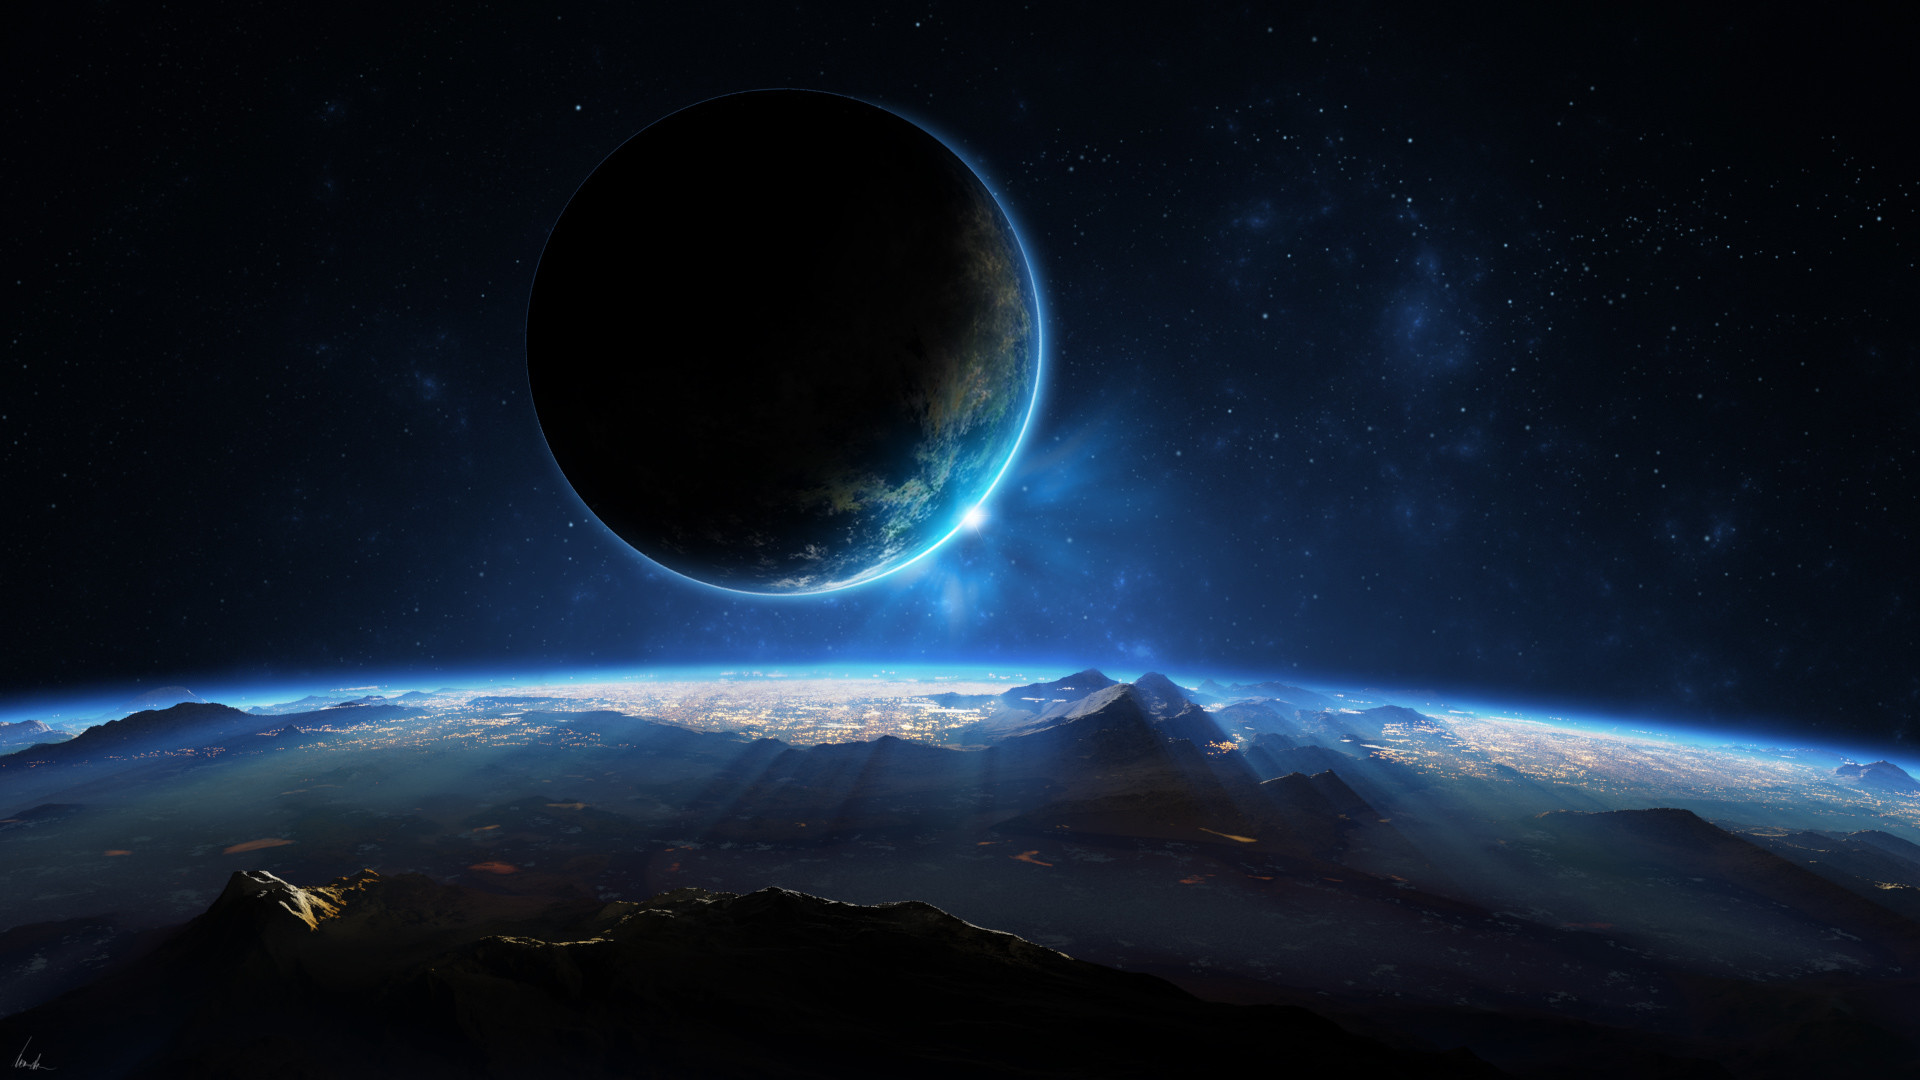 Alien Landscape Planet Stars Starlight space planets wallpaper |  | 79480 | WallpaperUP